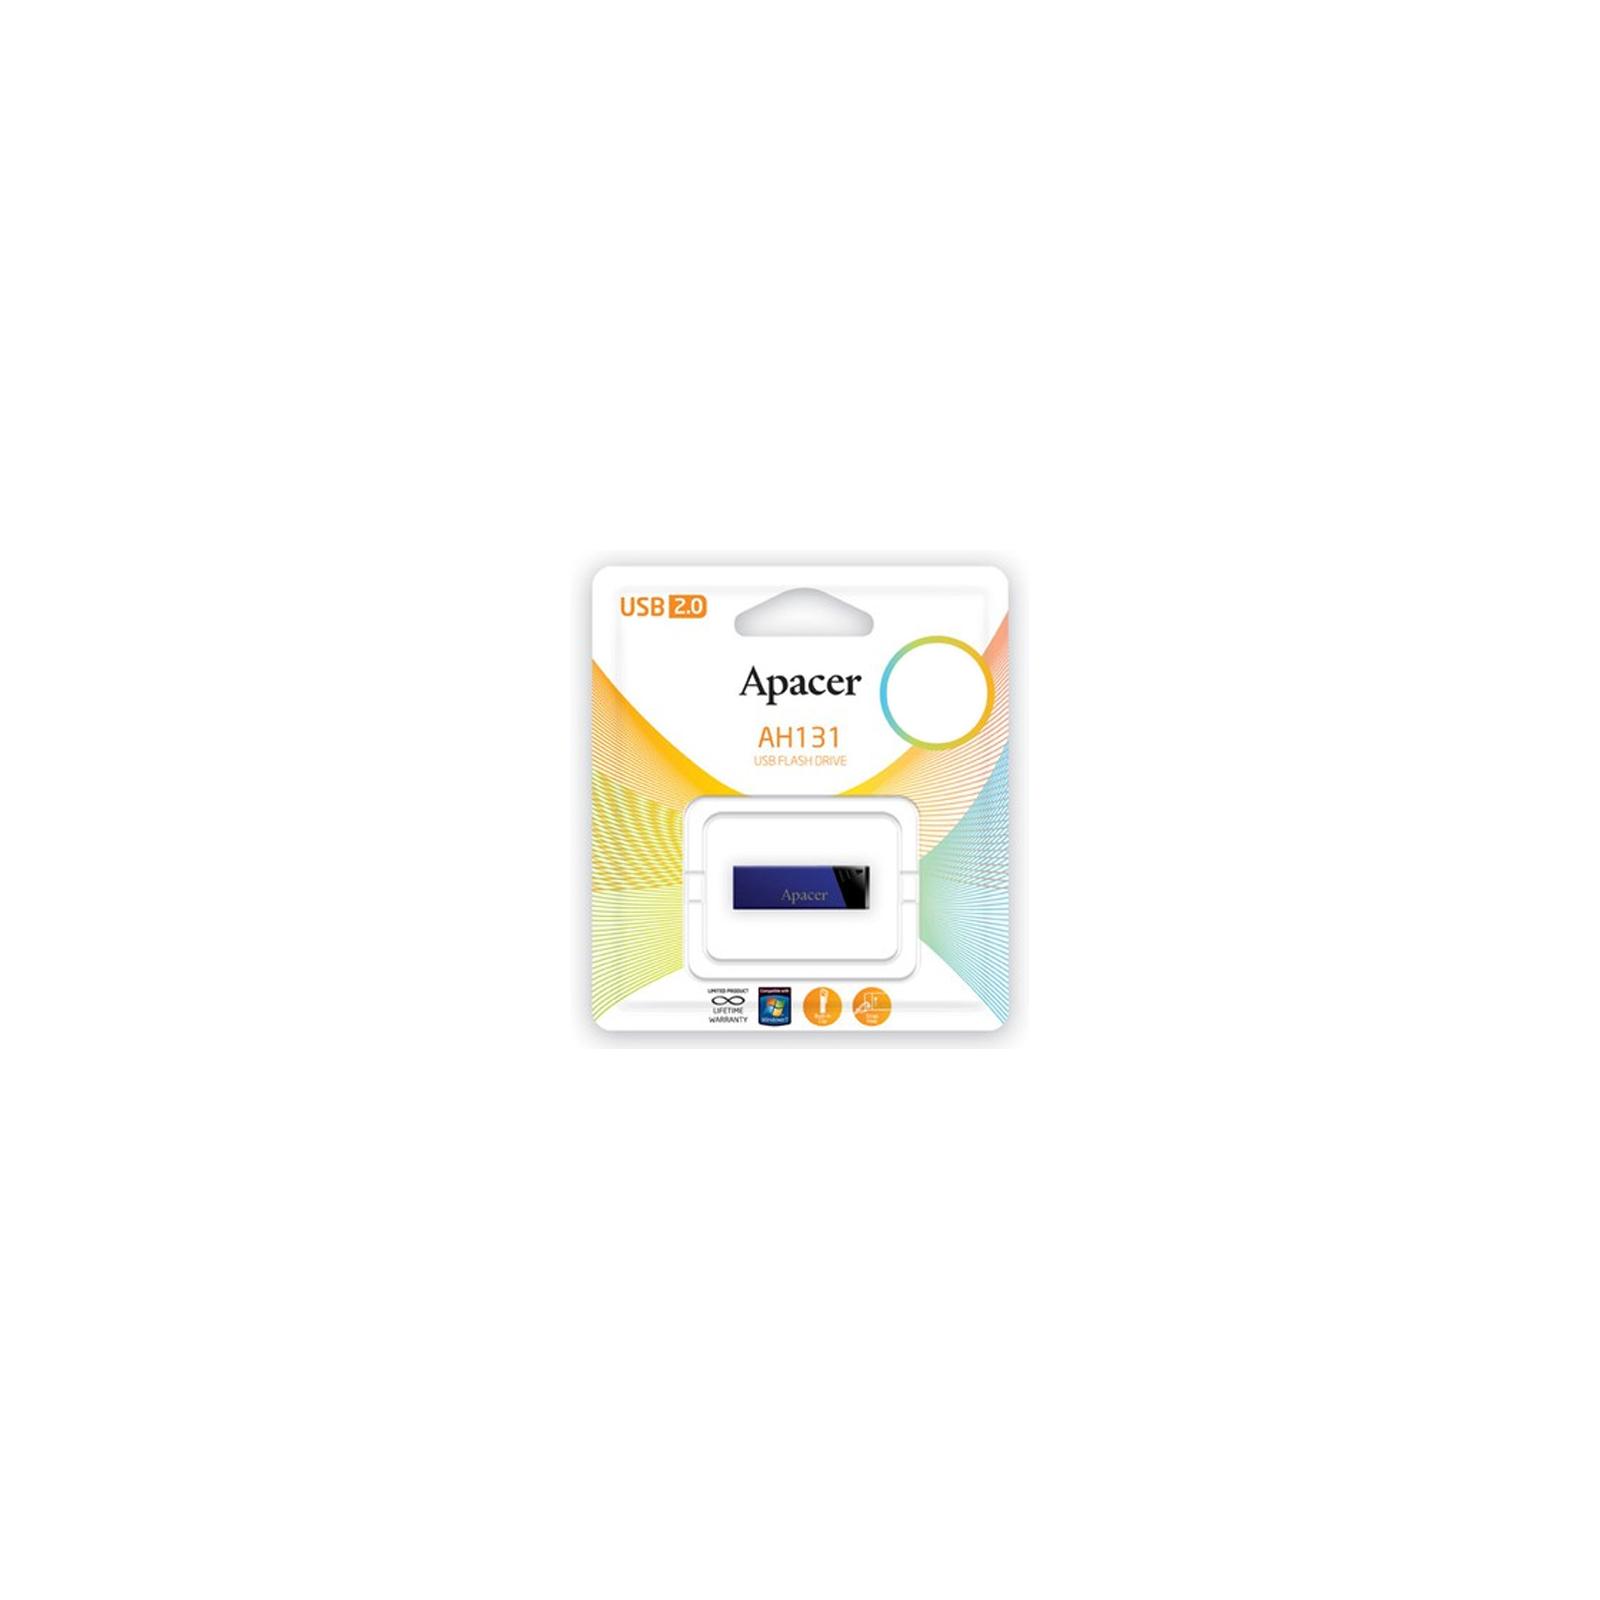 USB флеш накопитель 8GB AH131 Blue RP USB2.0 Apacer (AP8GAH131U-1) изображение 4